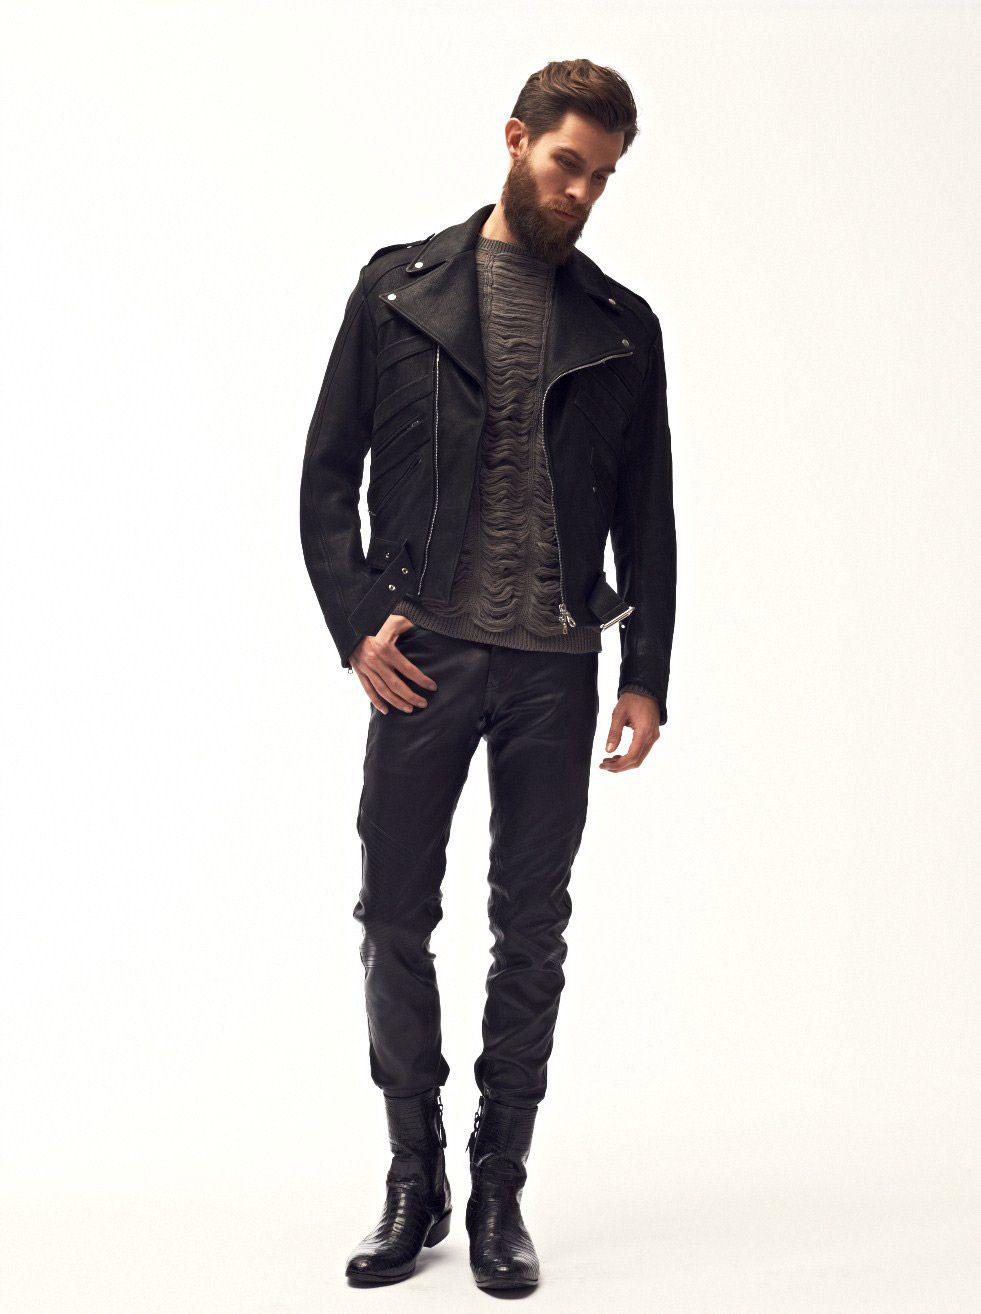 Dominic Louis | Fall/Winter 2013